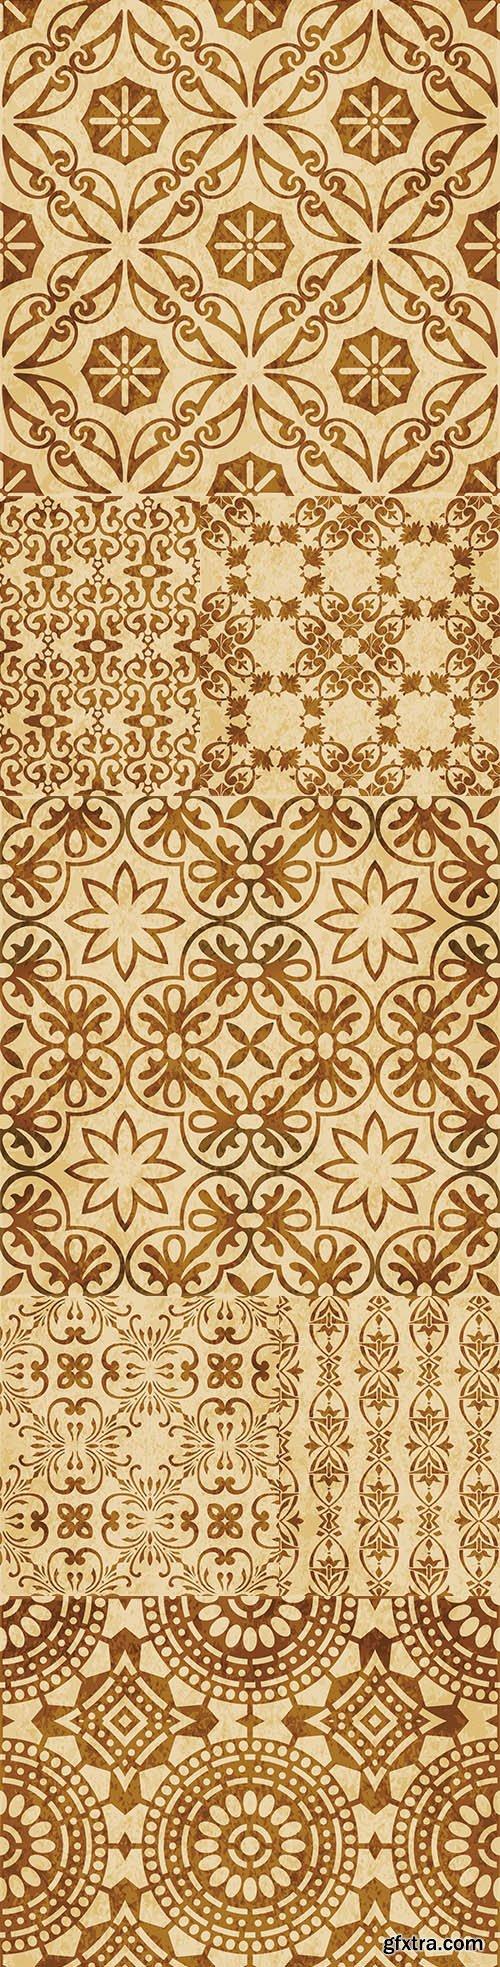 Retro brown textured background decorative elements